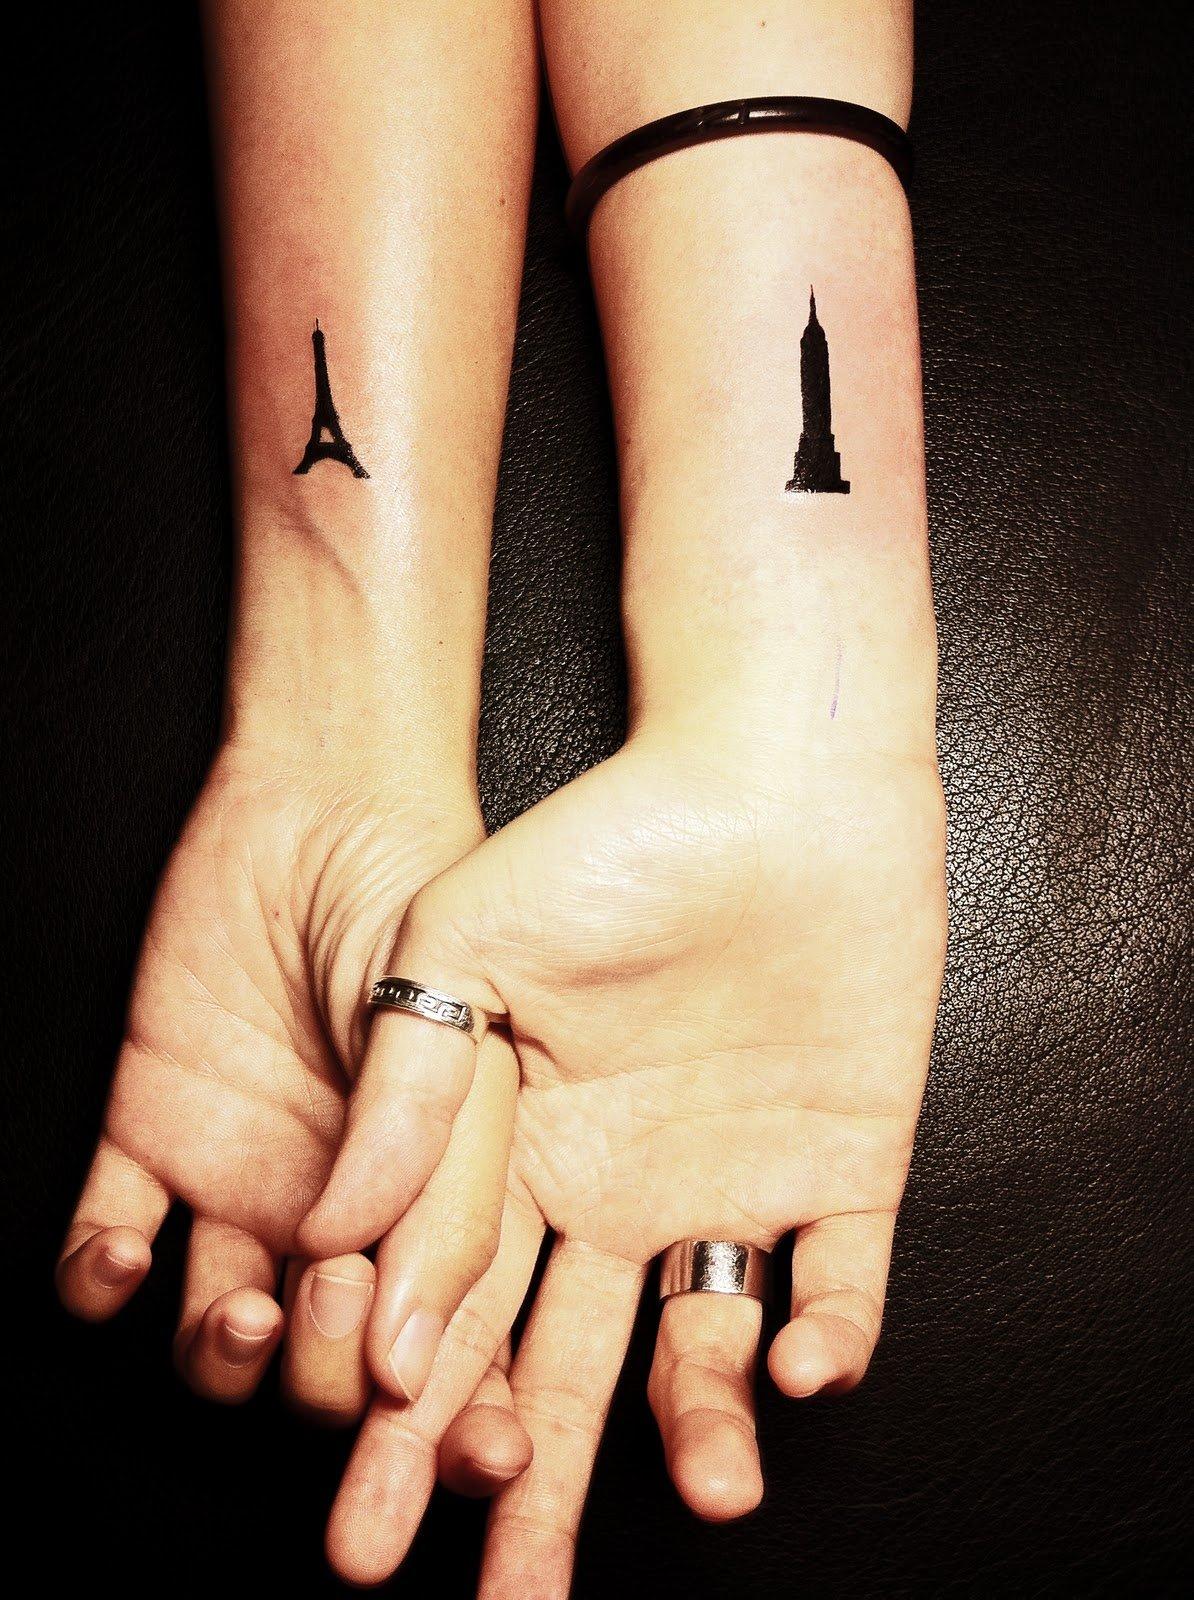 30 Fotos De Ideas De Tatuajes Para Las Parejas Enamoradas - Tatuaje-parejas